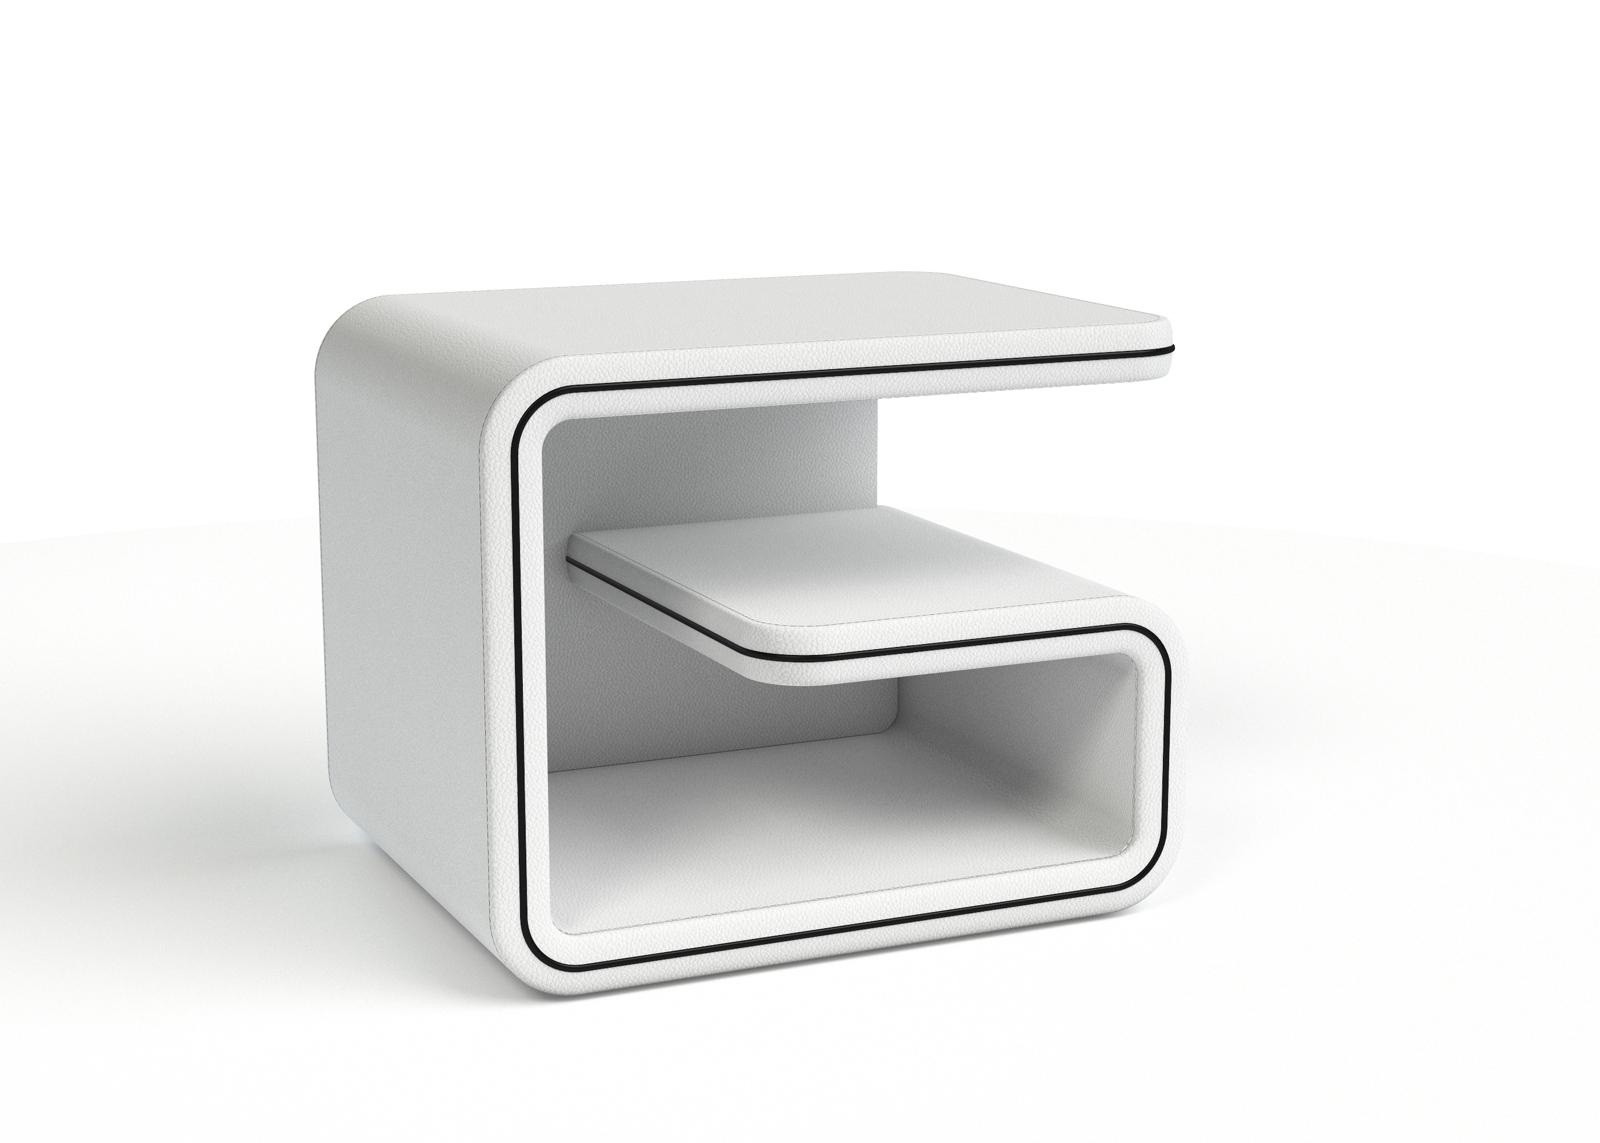 sam nachtkommode wei cords schwarz rechts nako 99. Black Bedroom Furniture Sets. Home Design Ideas